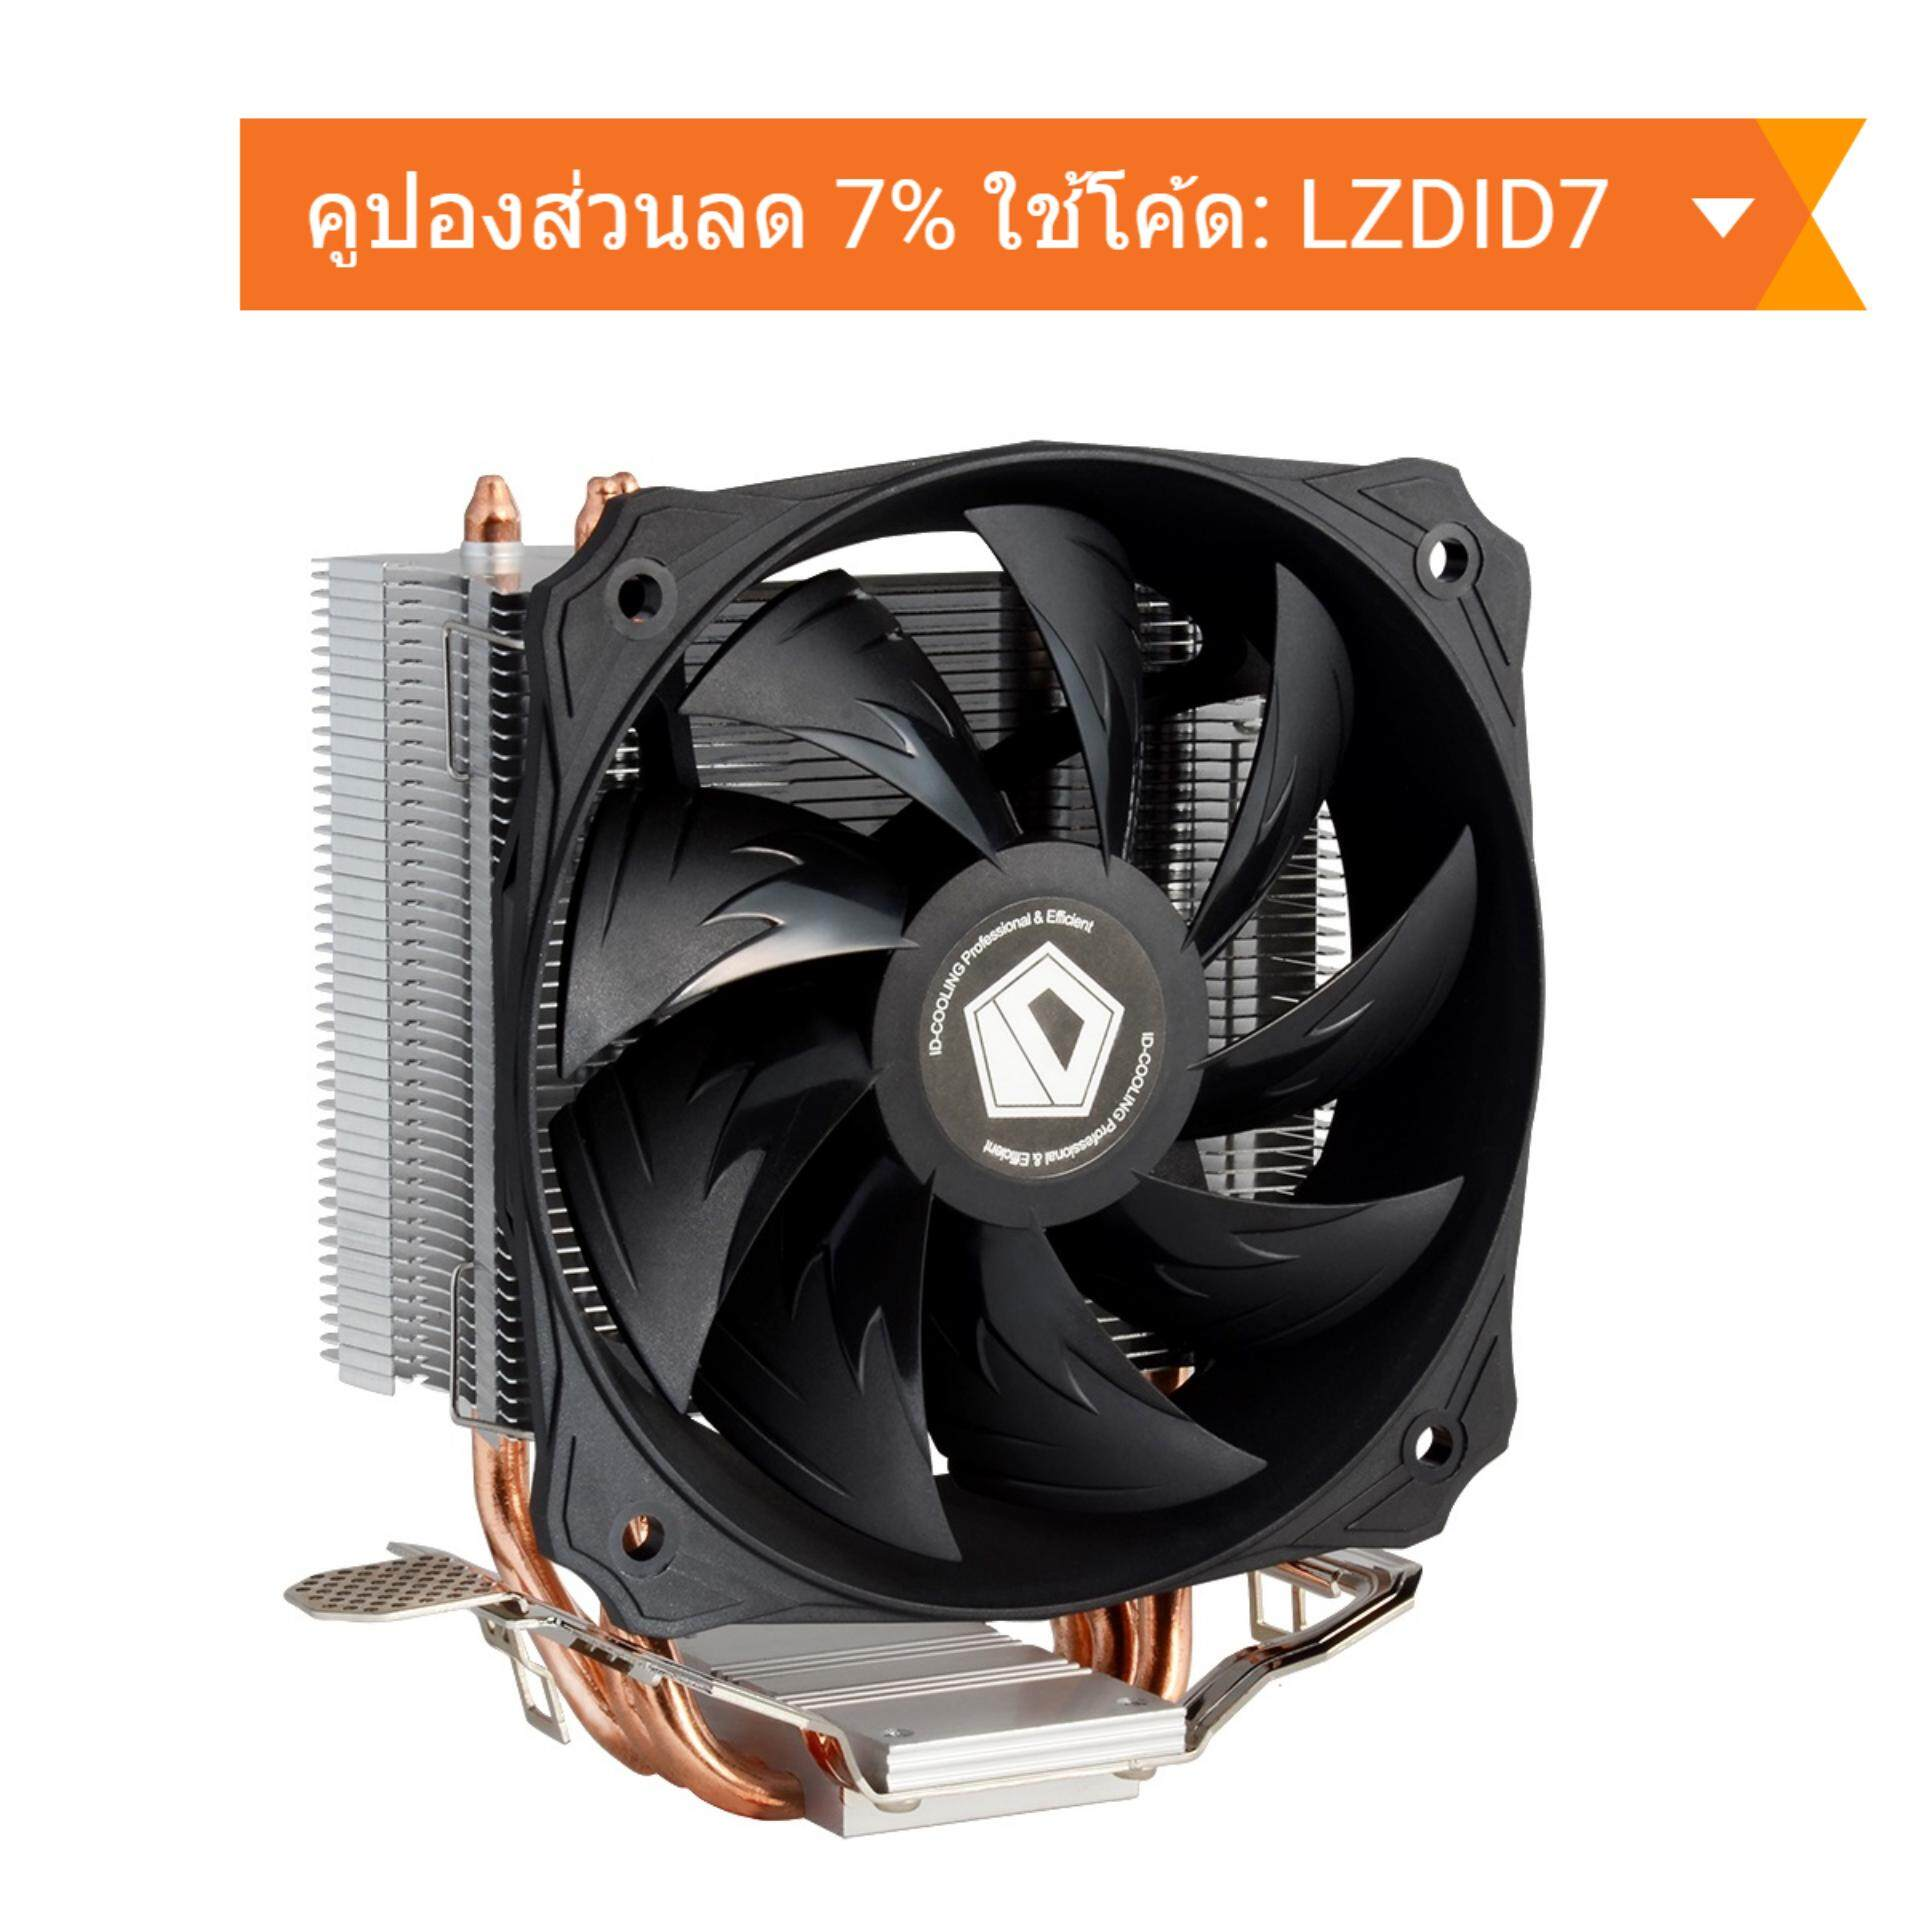 ID-COOLING SE-213V2 พัดลมระบายความร้อน CPU